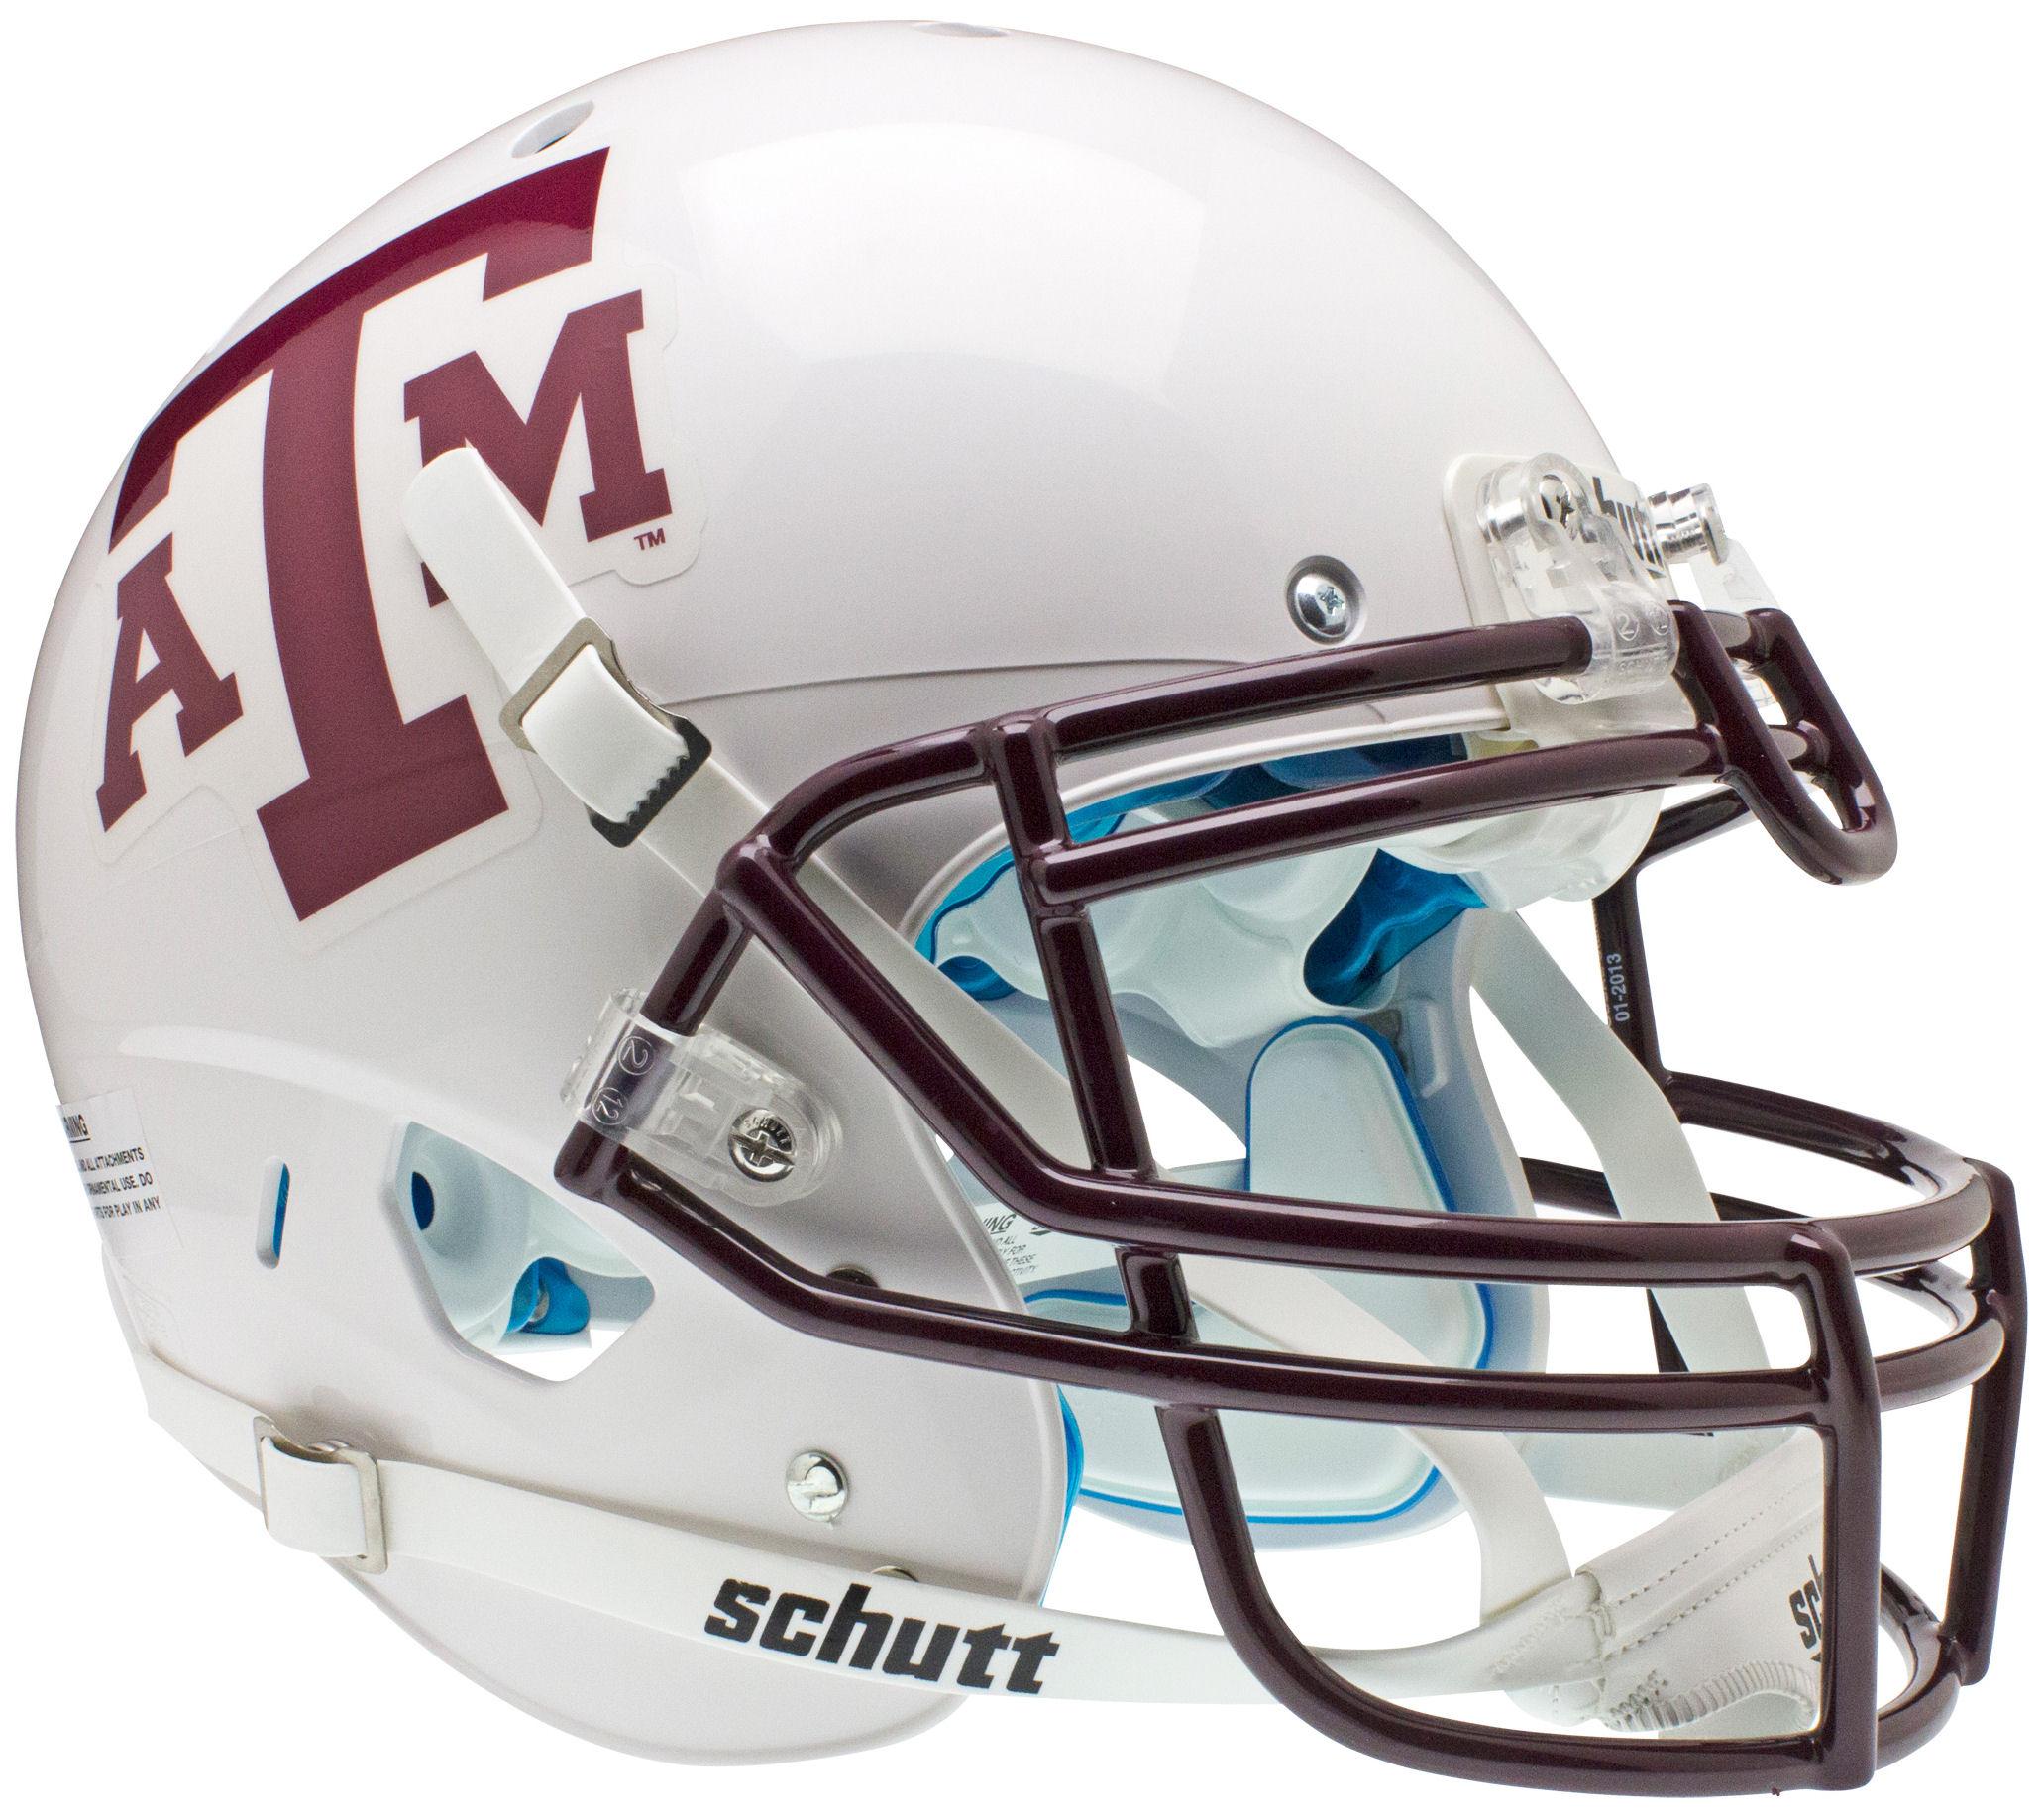 Texas A&M Aggies Authentic College XP Football Helmet Schutt <B>White Maroon Mask</B>